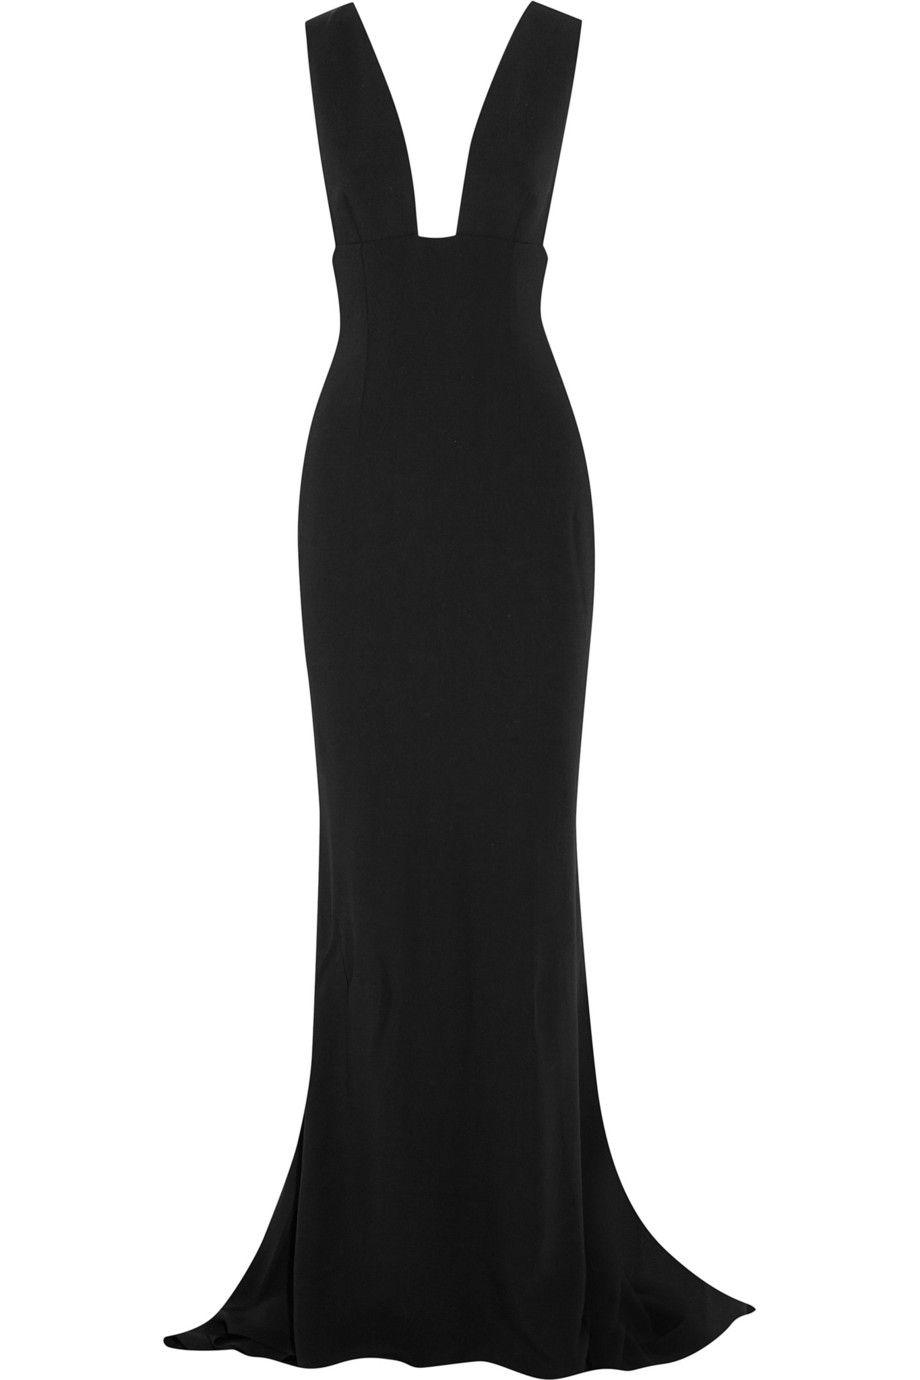 Stella McCartney | Kimberly stretch-cady gown